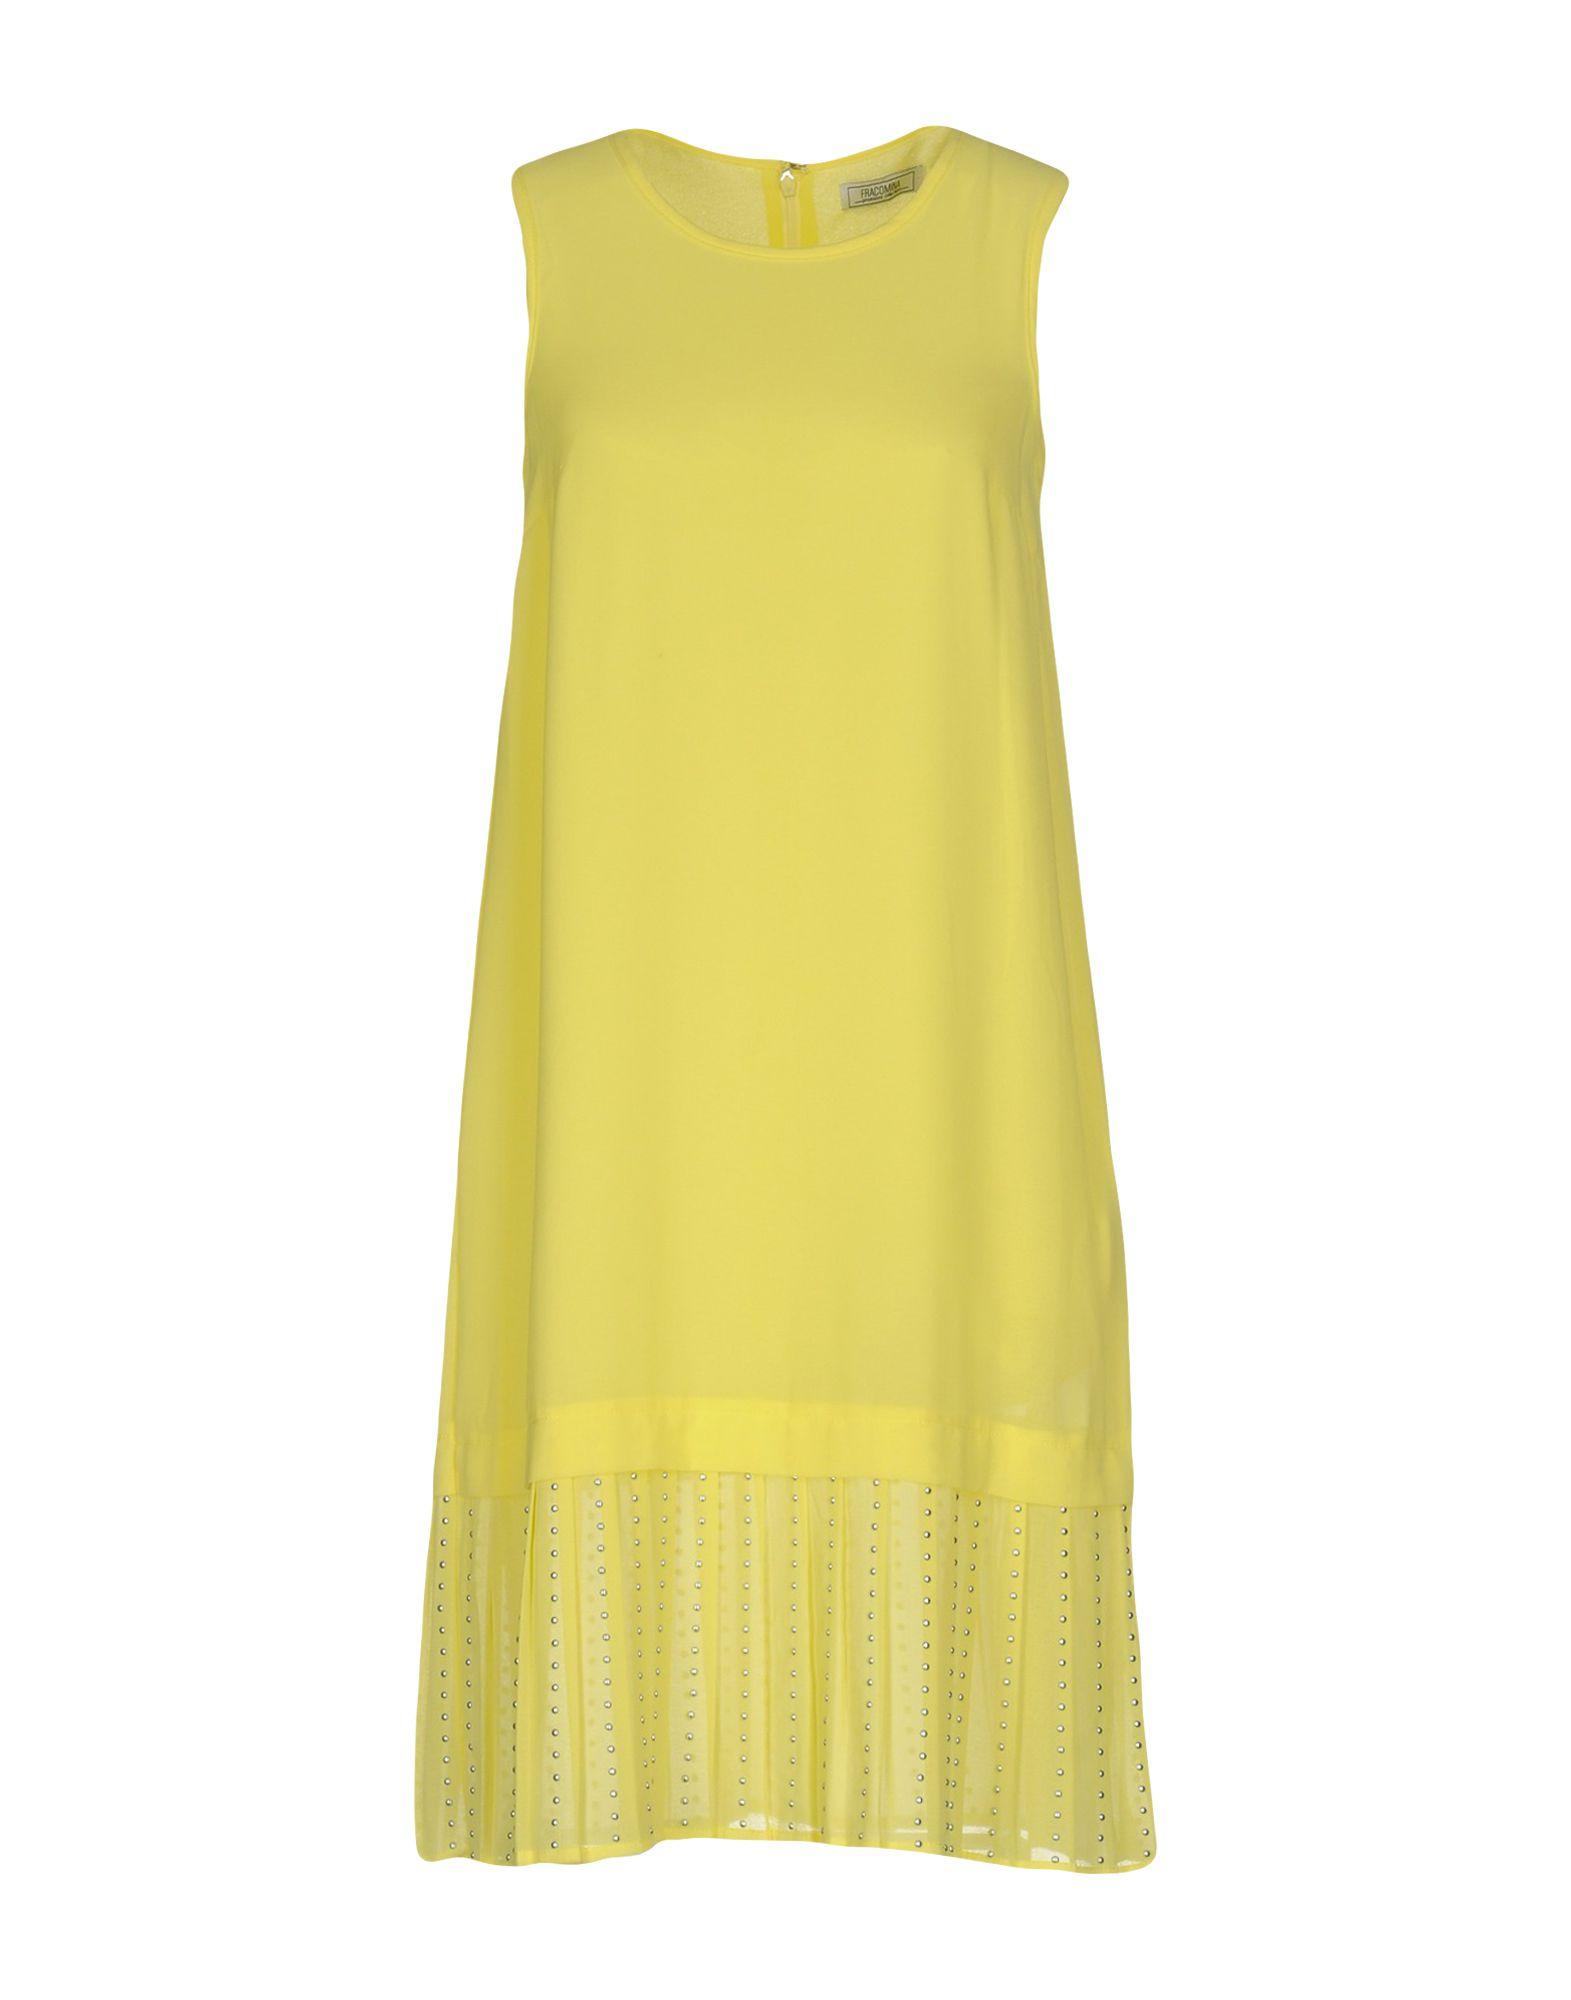 FRACOMINA Damen Kurzes Kleid Farbe Gelb Größe 4